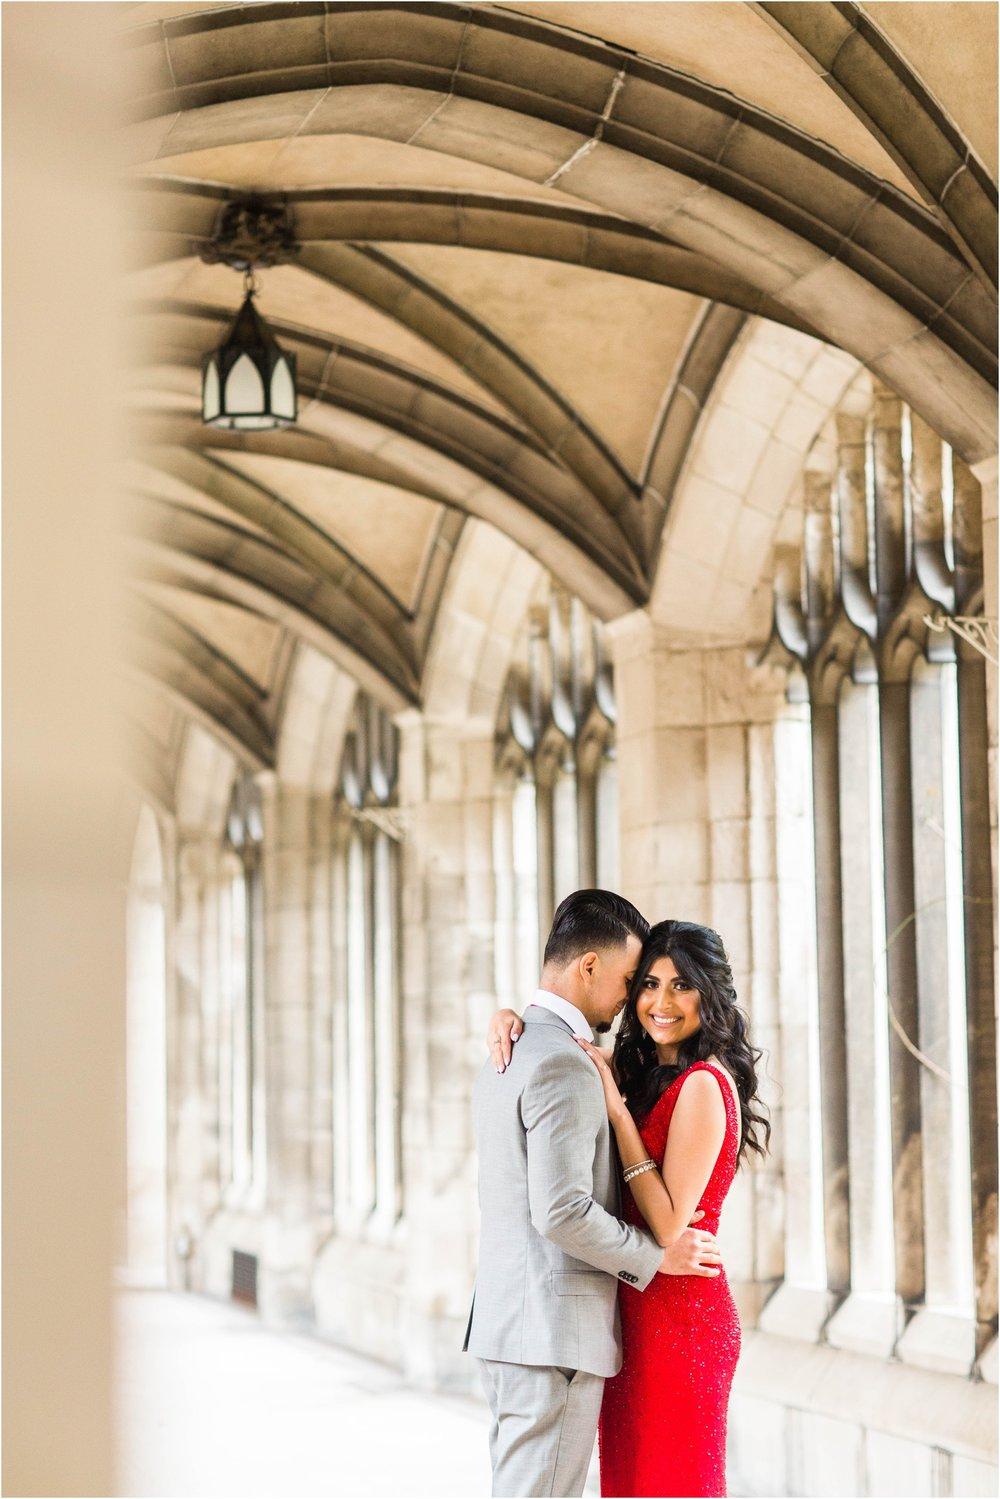 Knox-College-U-of-T-University-of-Toronto-Distillery-District-Engagement-Session-Toronto-Mississauga-Brampton-Scarborough-GTA-Pakistani-Indian-Wedding-Engagement-Photographer-Photography_0013.jpg